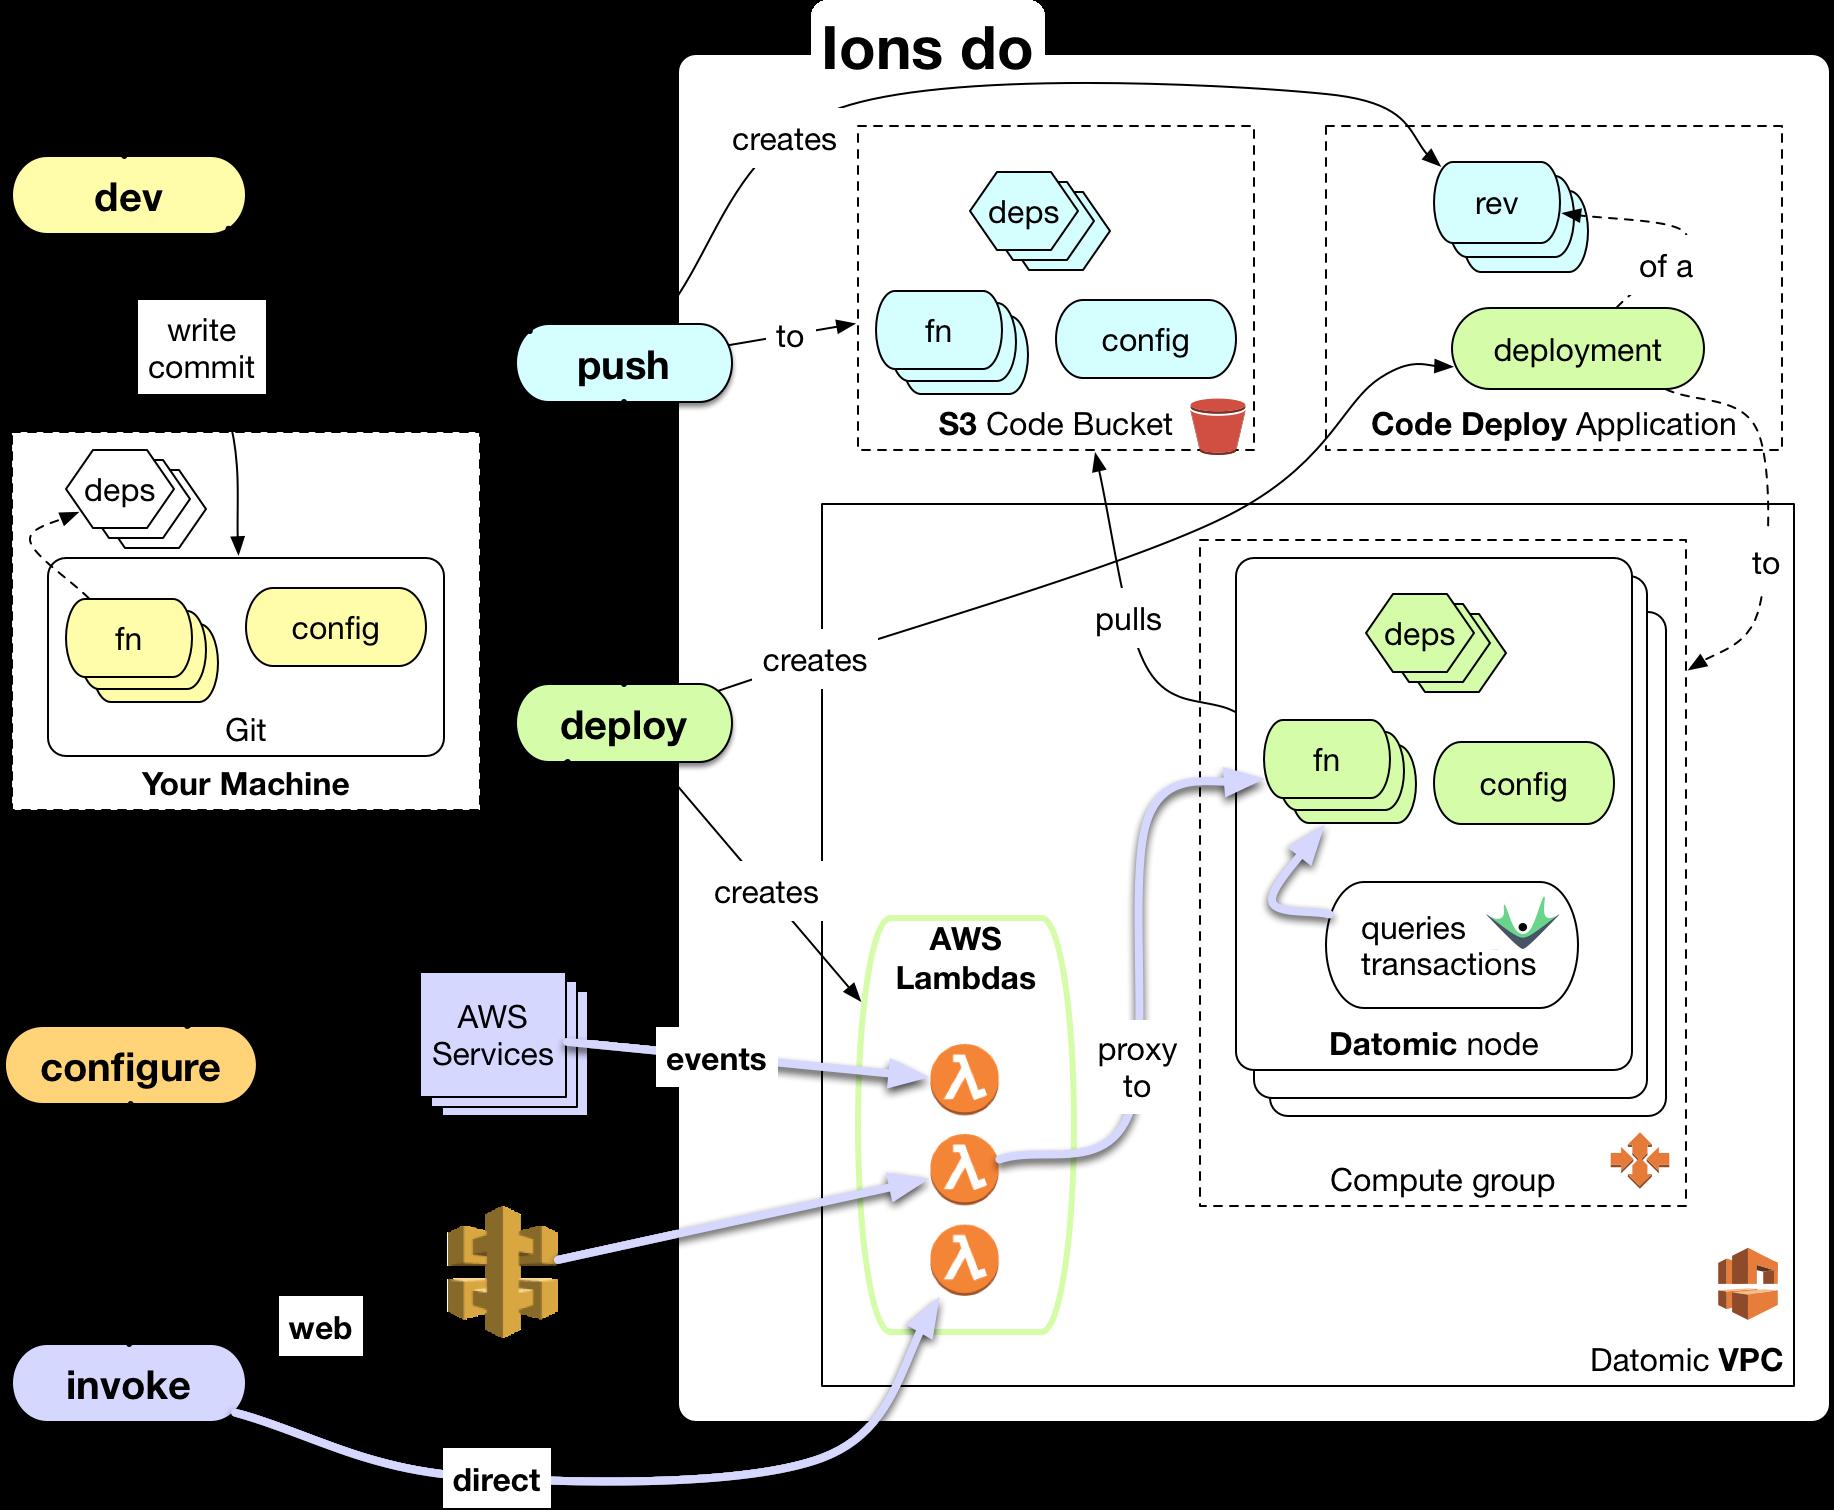 Ions | Datomic | Coding, Deployment, Git